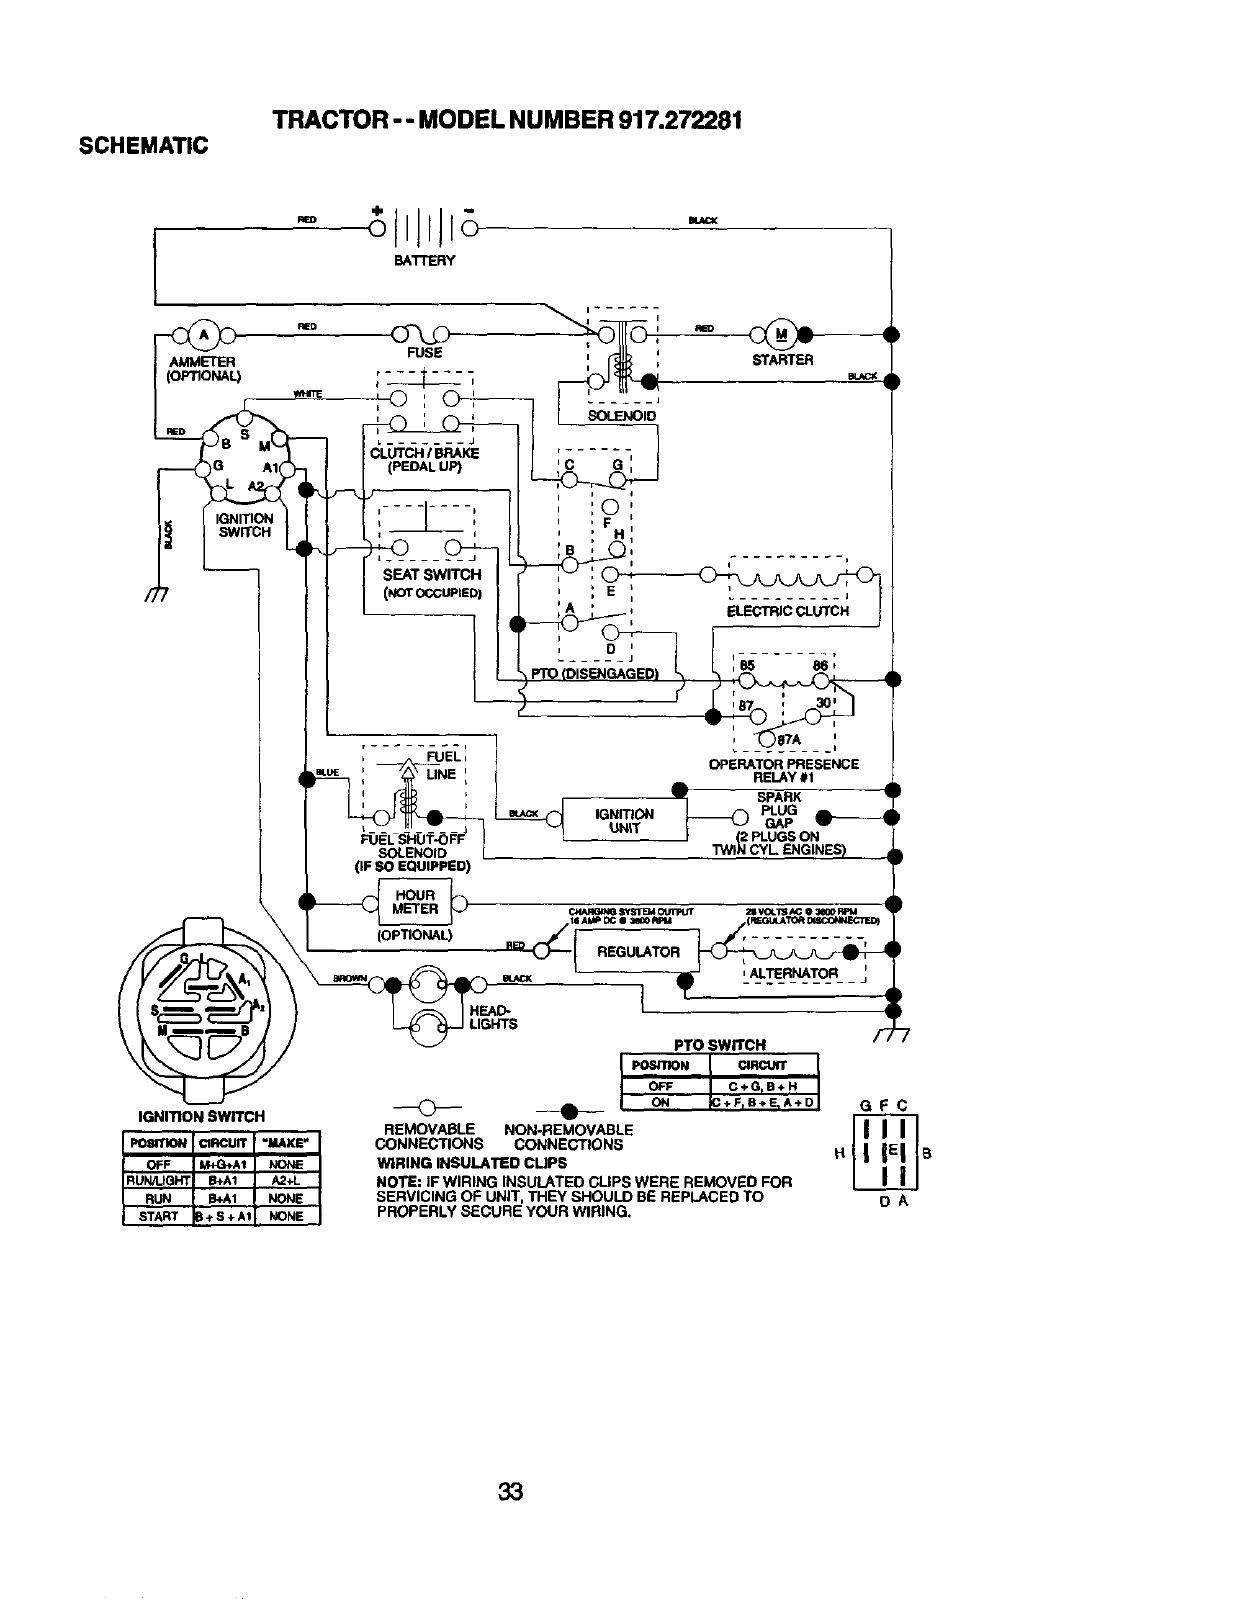 Craftsman 917 272281 Users Manual